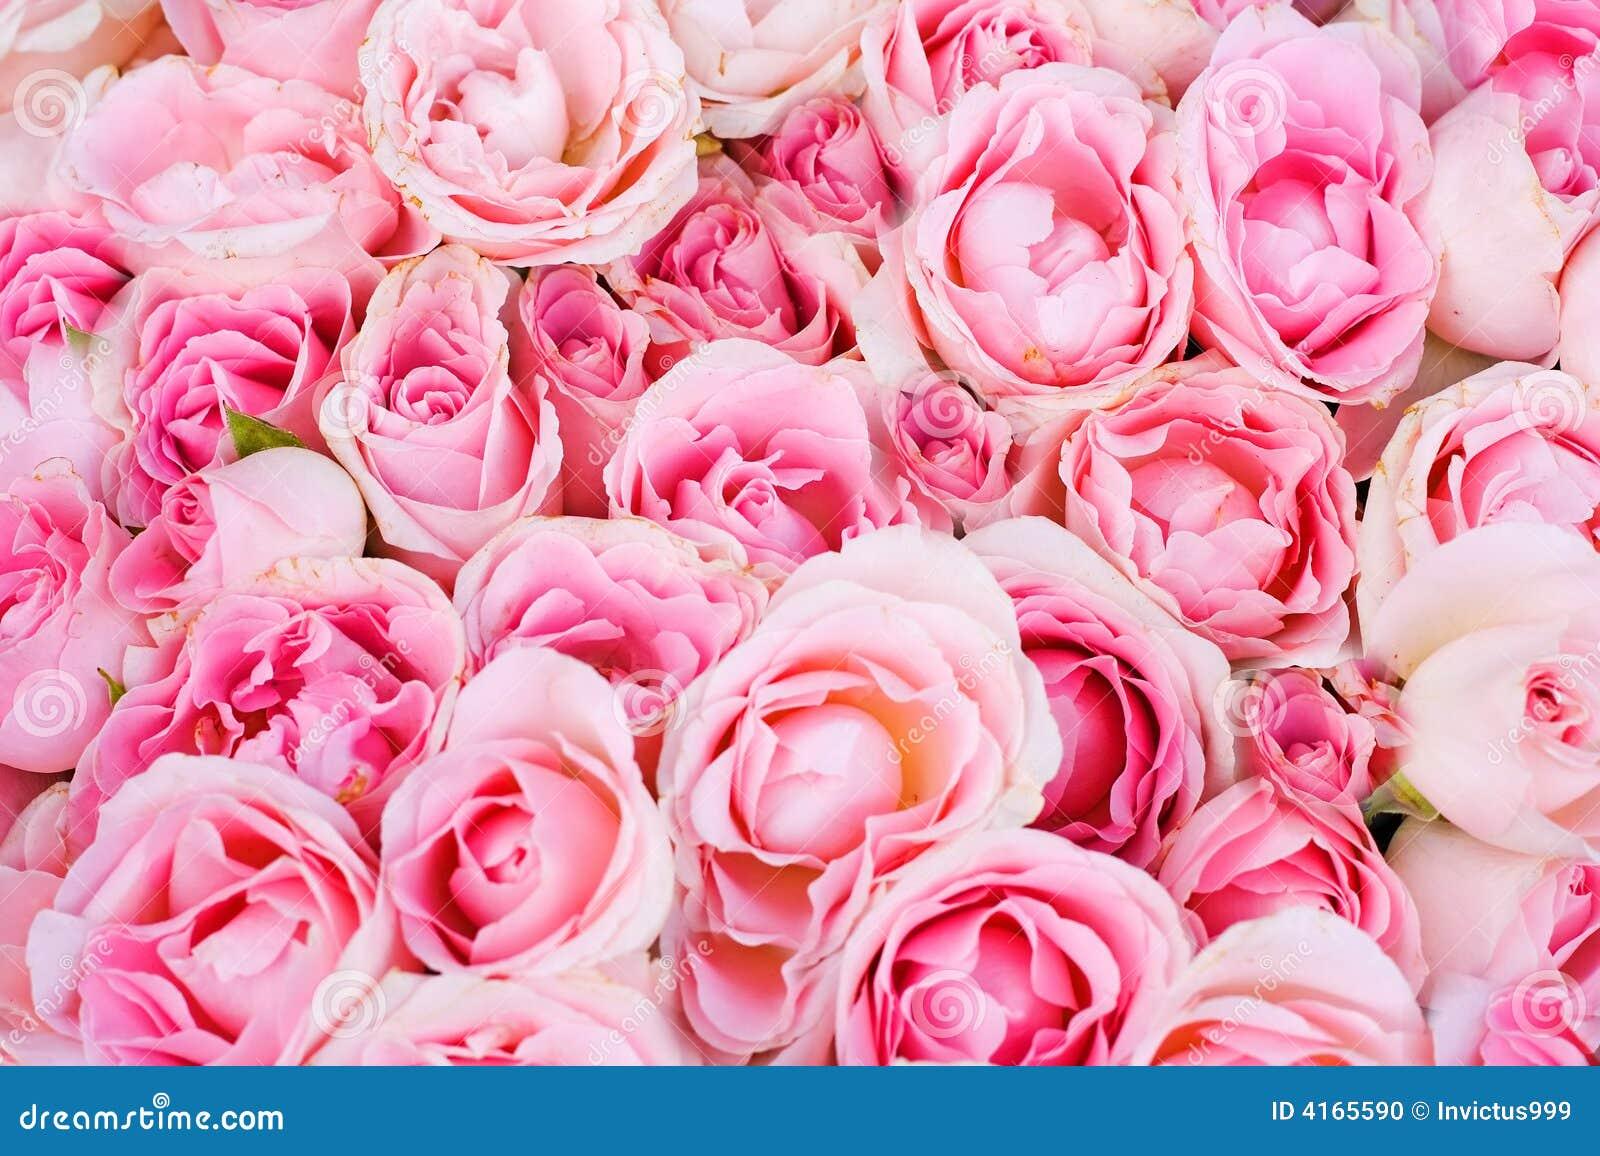 Pink Roses Pink roses stock photo   1300 x 956 jpeg 213kB